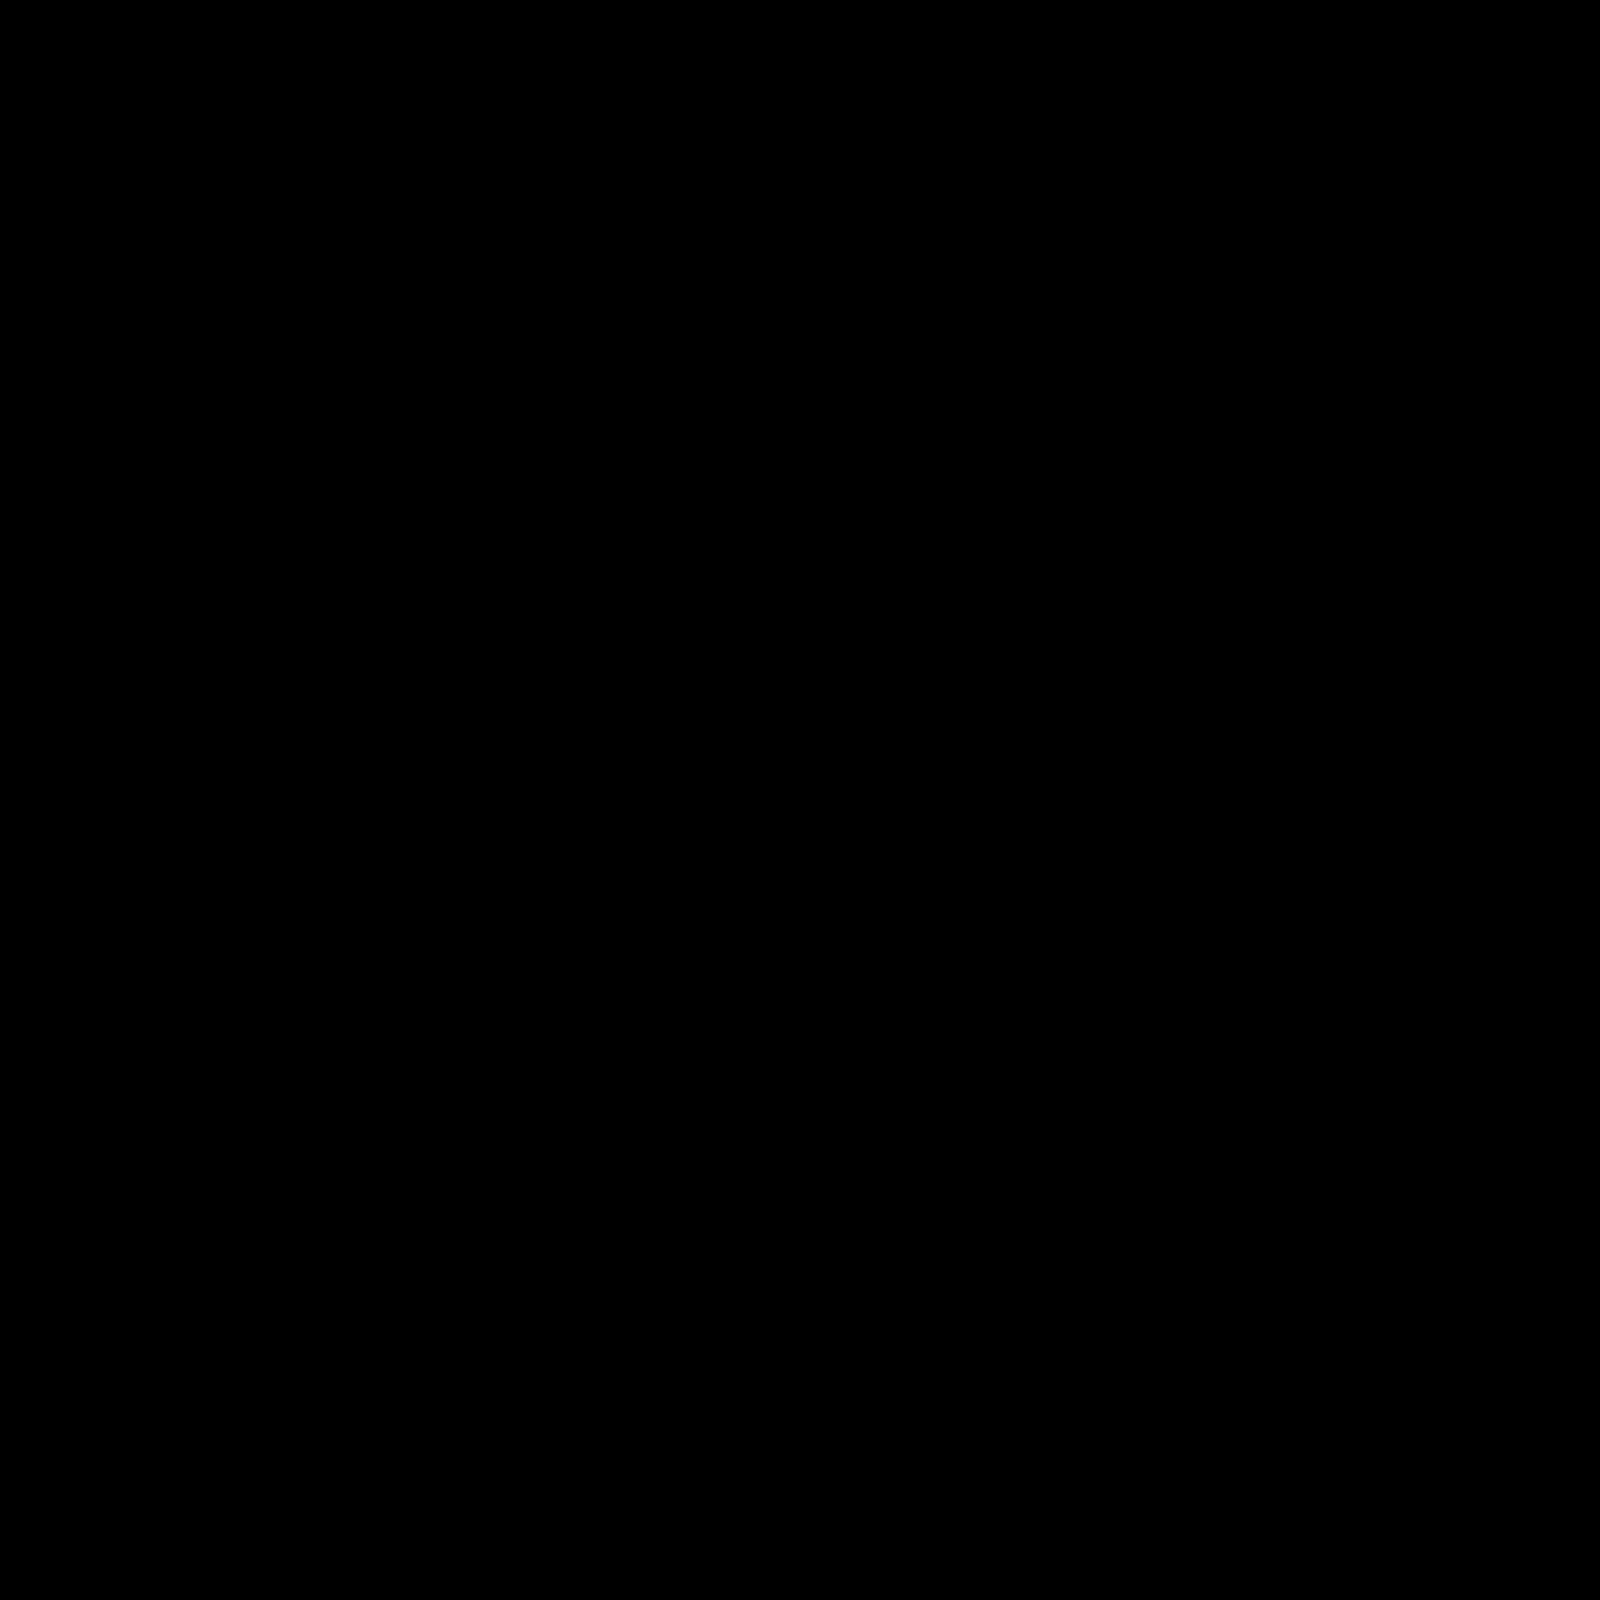 Autobahn icon